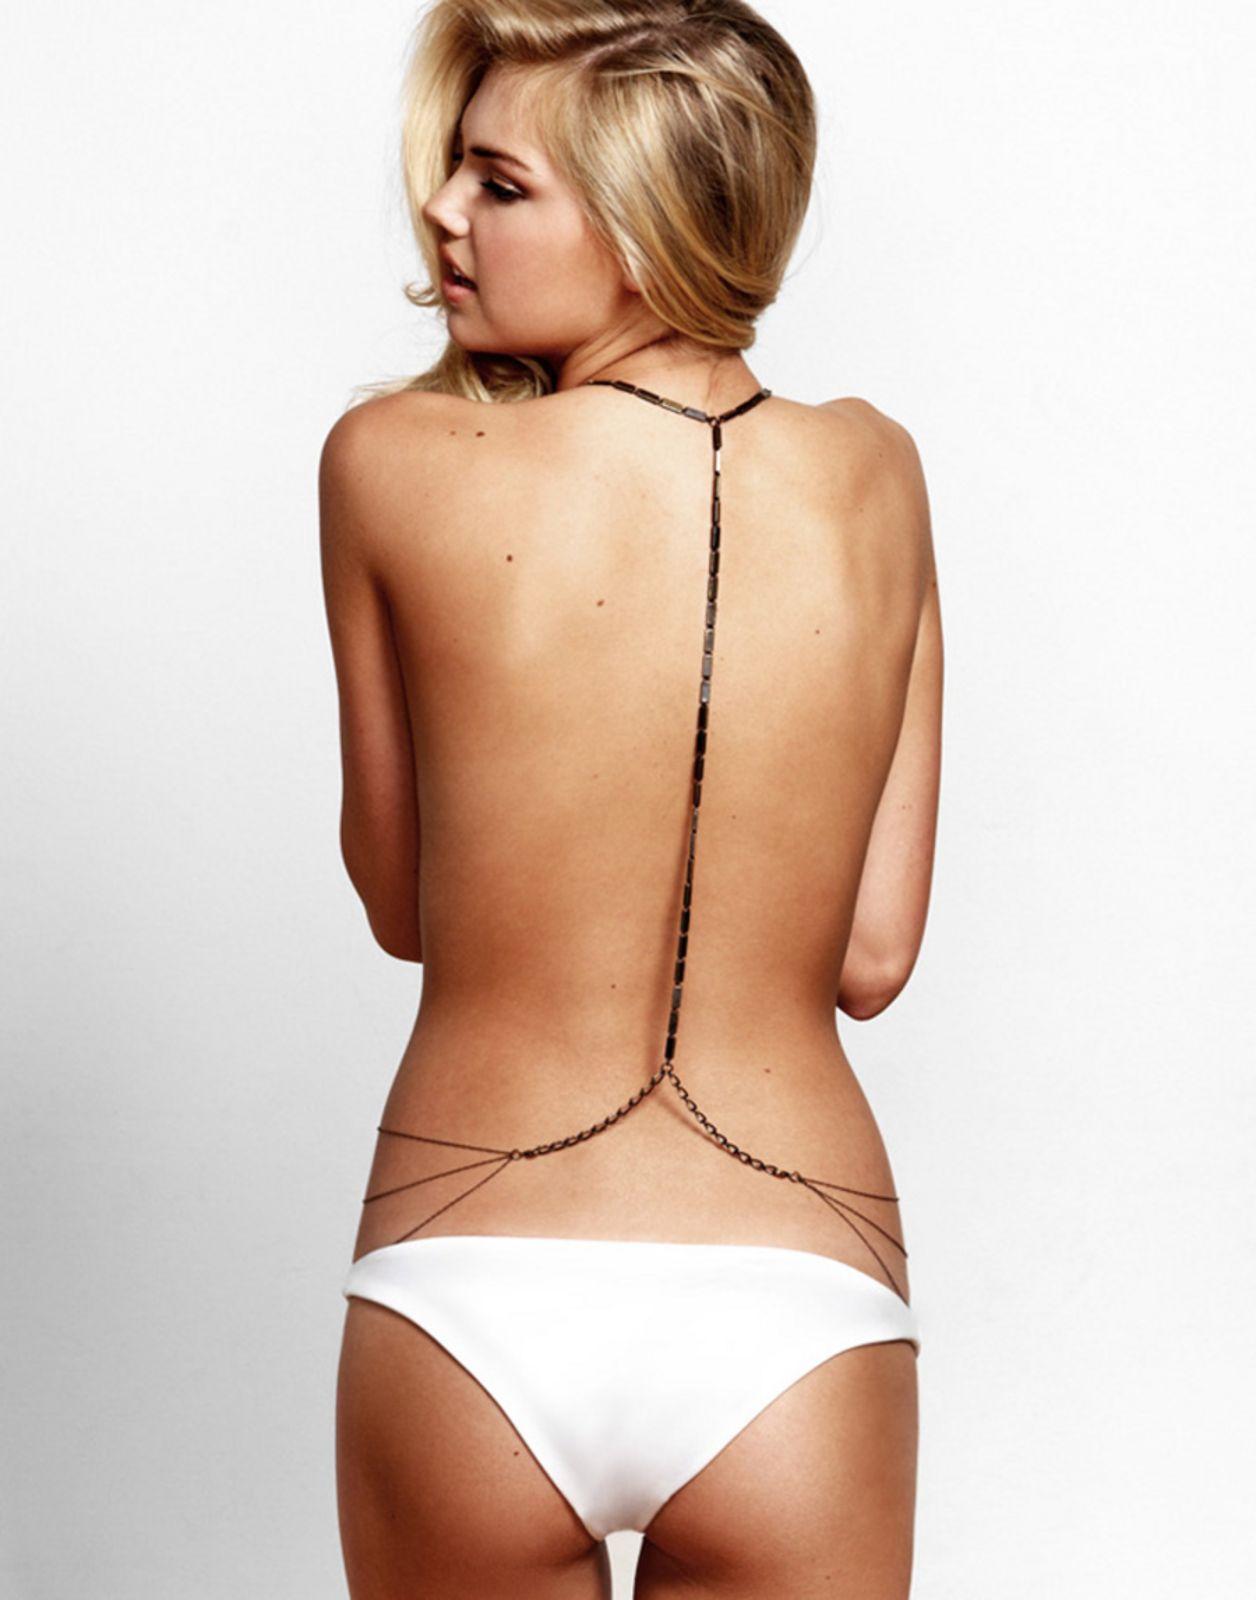 http://1.bp.blogspot.com/-h-VwHNFDXo0/TZ2G5Rq8x0I/AAAAAAAASlk/gHMhfAeqAqg/s1600/Kate-Upton-Backside-2.jpg